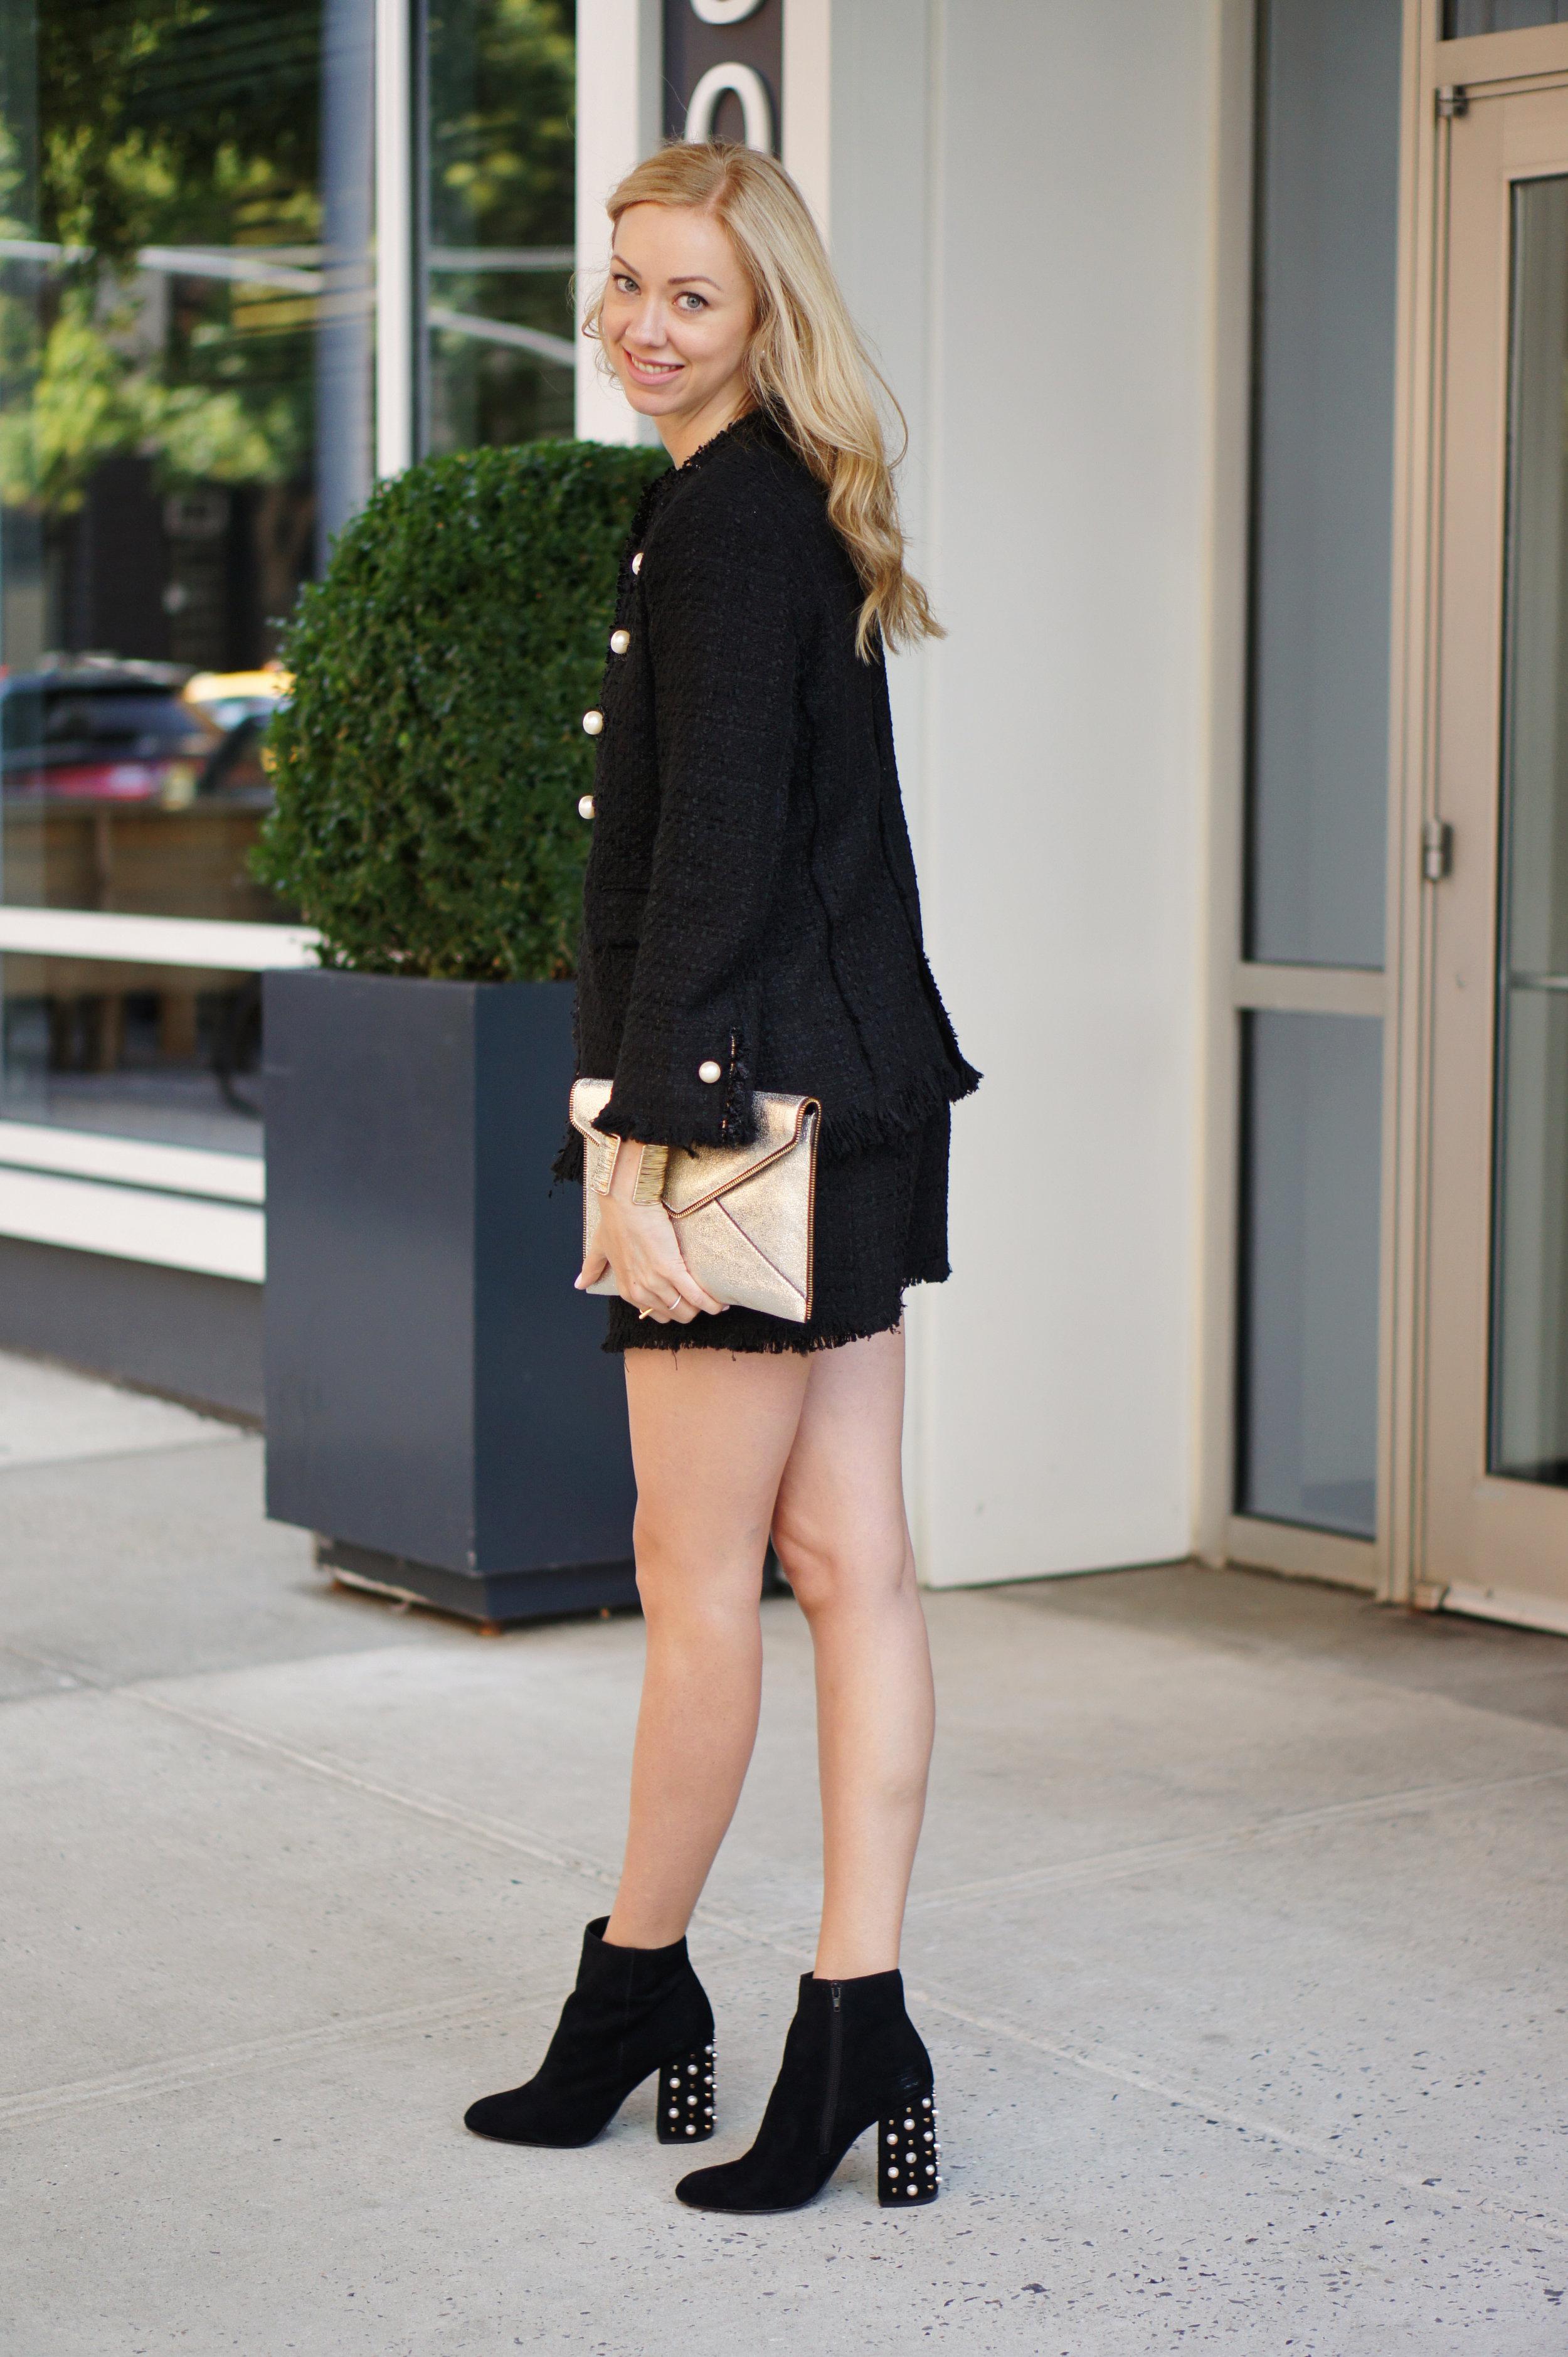 rebecca-minkoff-leo-clutch-black-boots-tweed-jacket-black.jpg